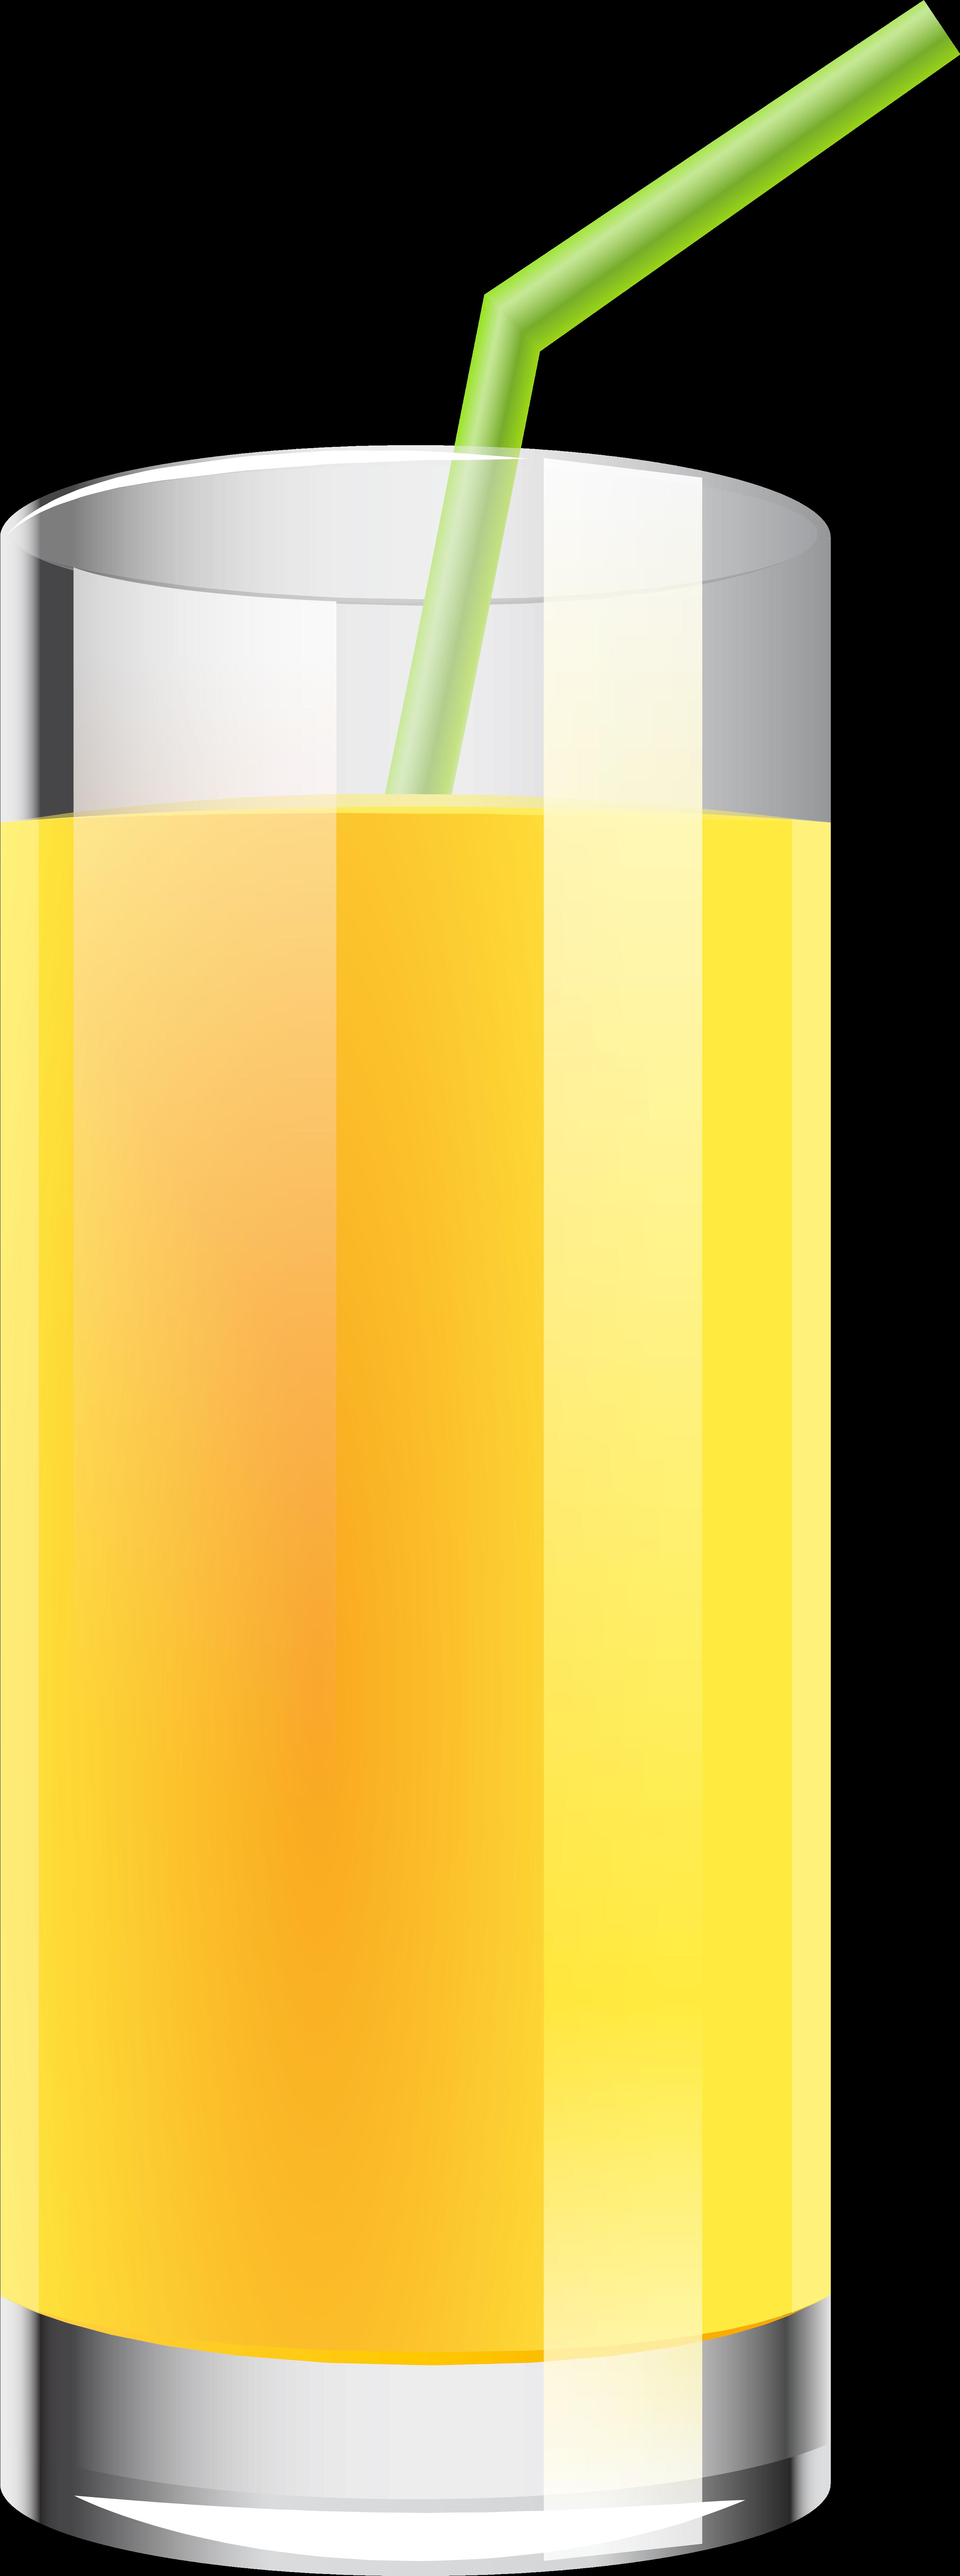 Transparent juice clipart - Orange Juice Png Clip Art - Graphic Design